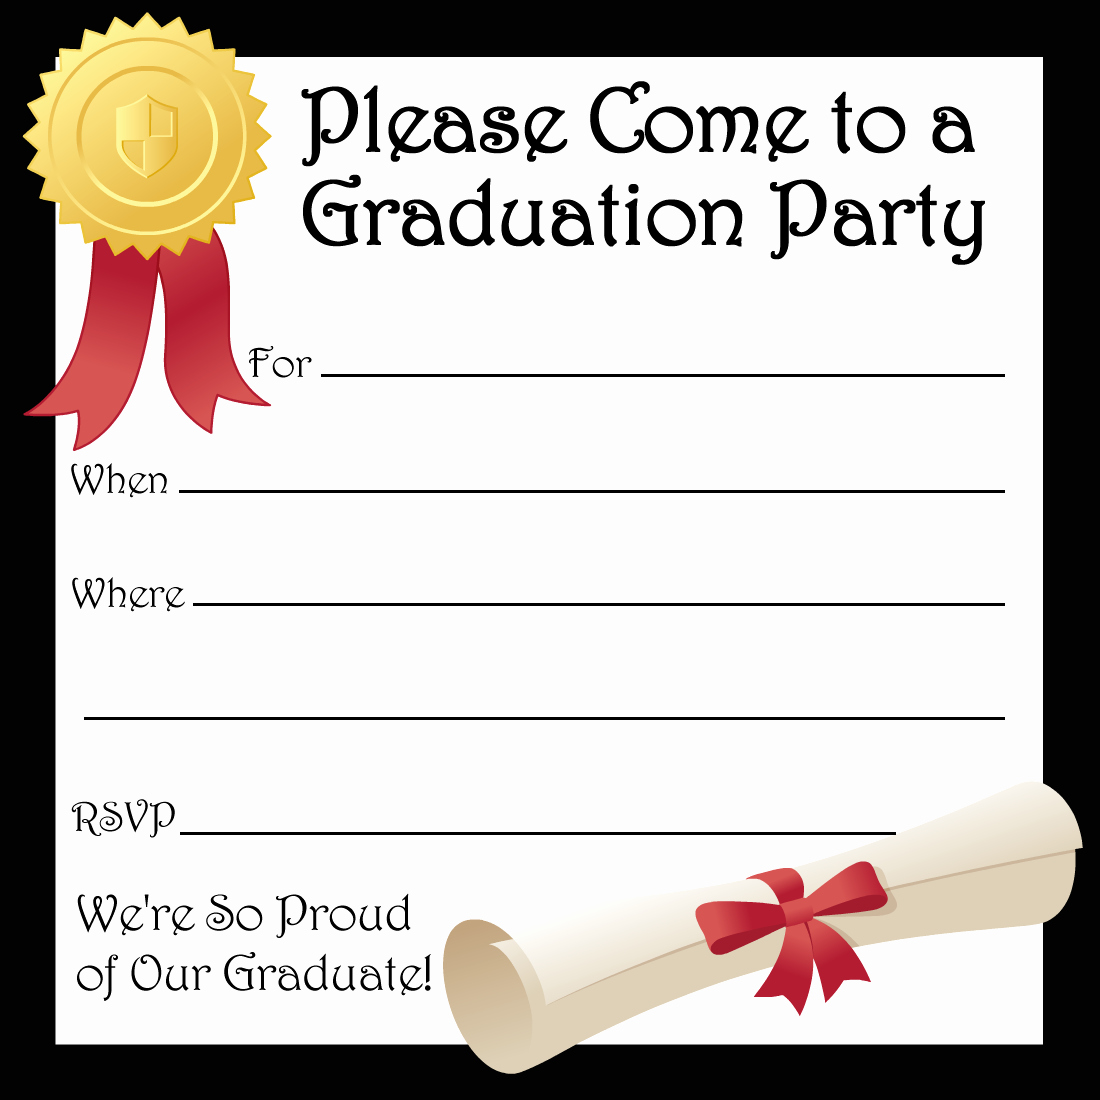 Graduation Reception Invitation Template Luxury 15 Graduation Party Invitations – Party Ideas